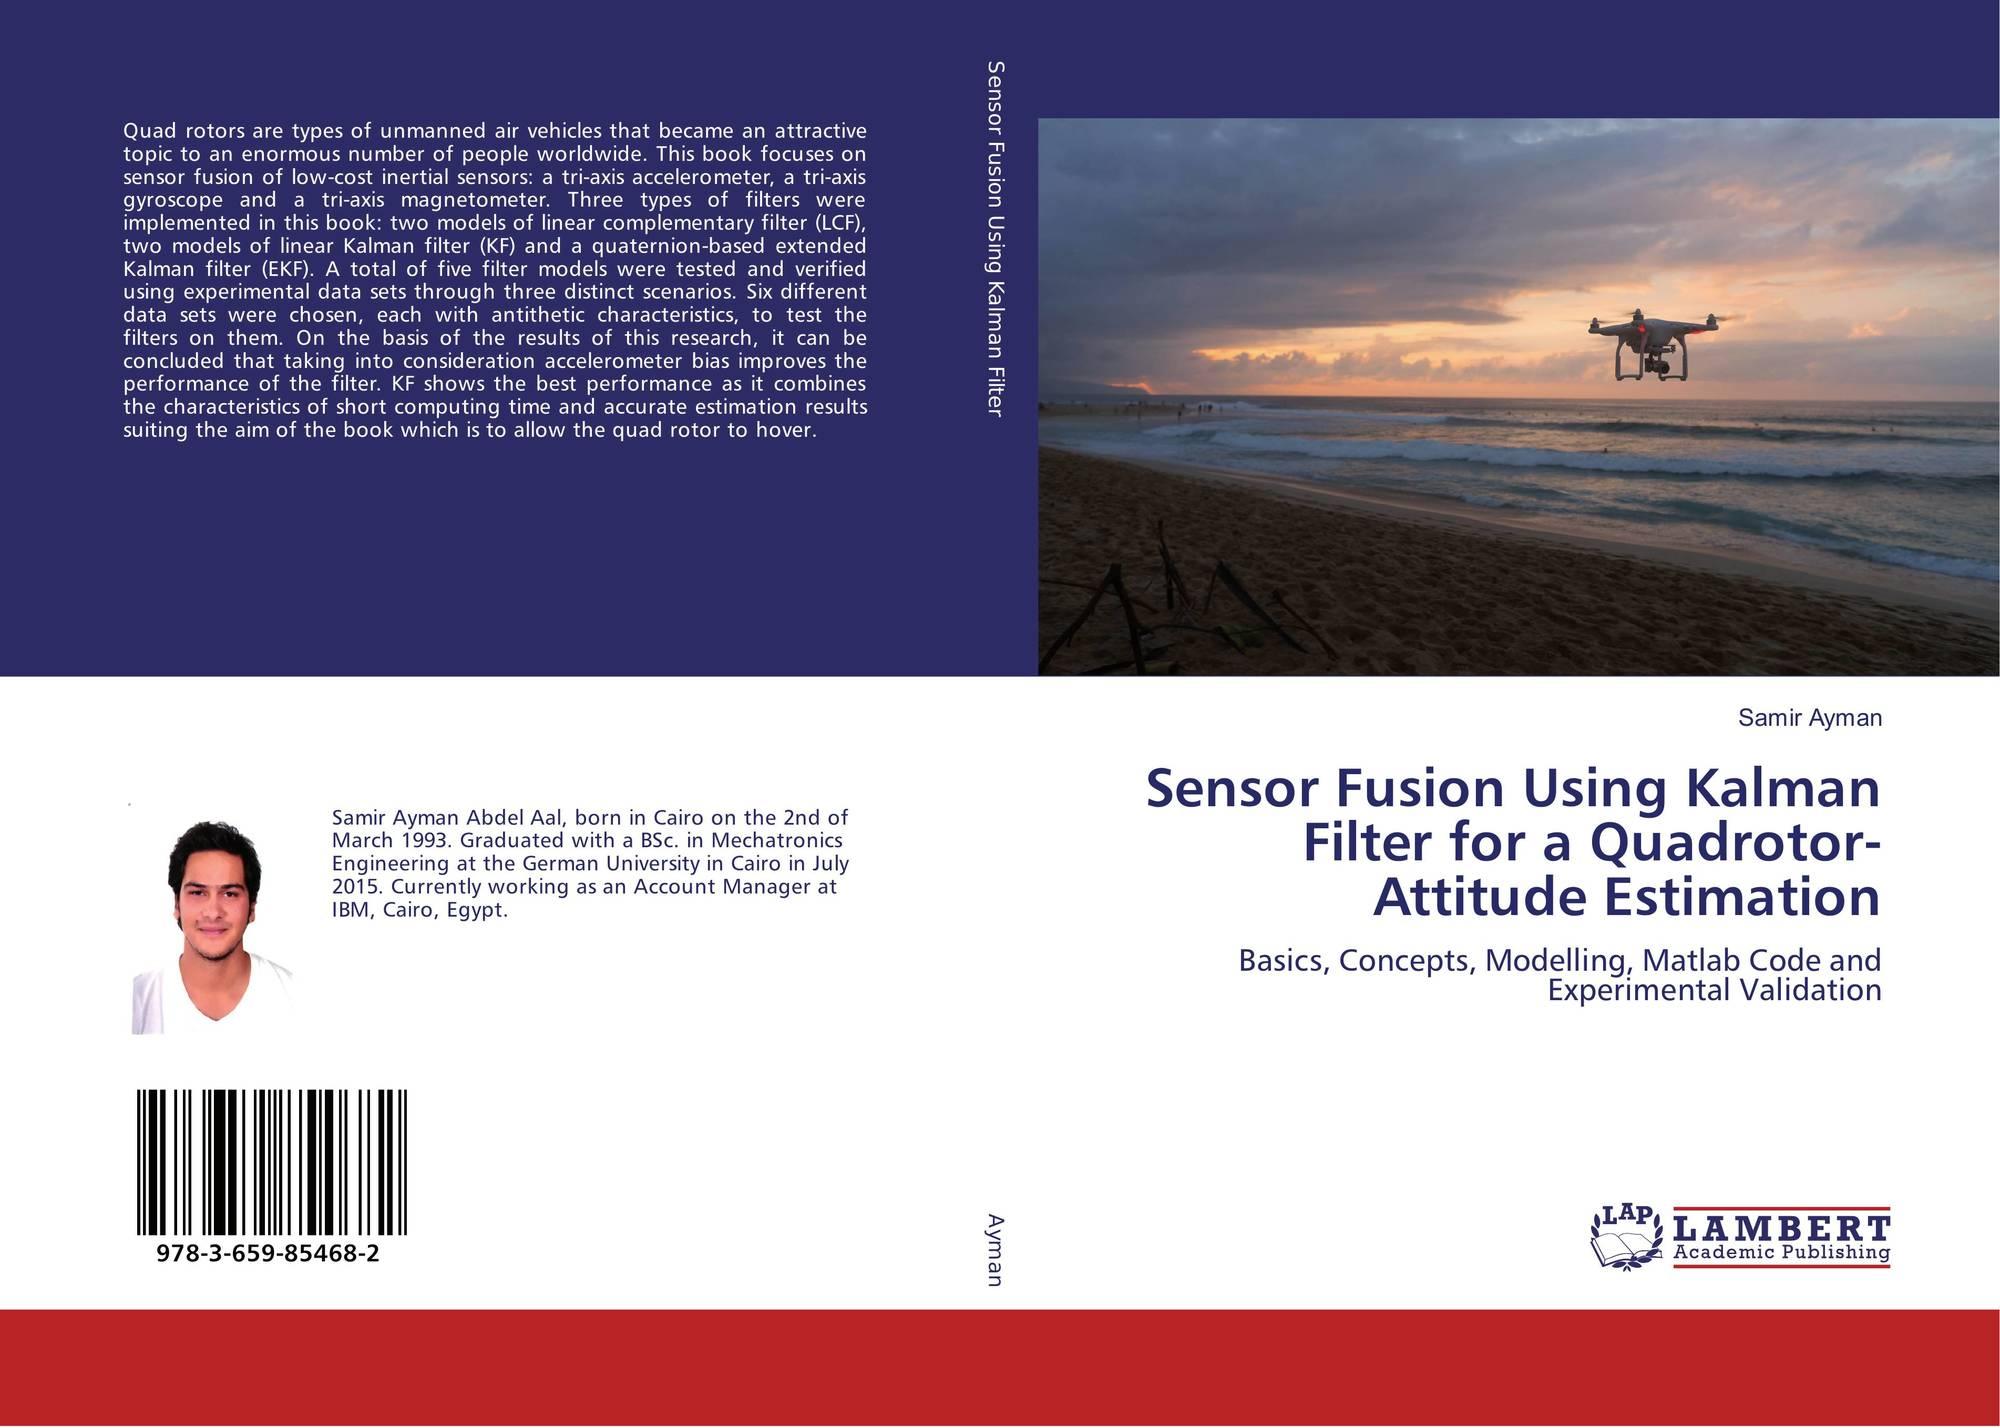 Sensor Fusion Using Kalman Filter for a Quadrotor-Attitude